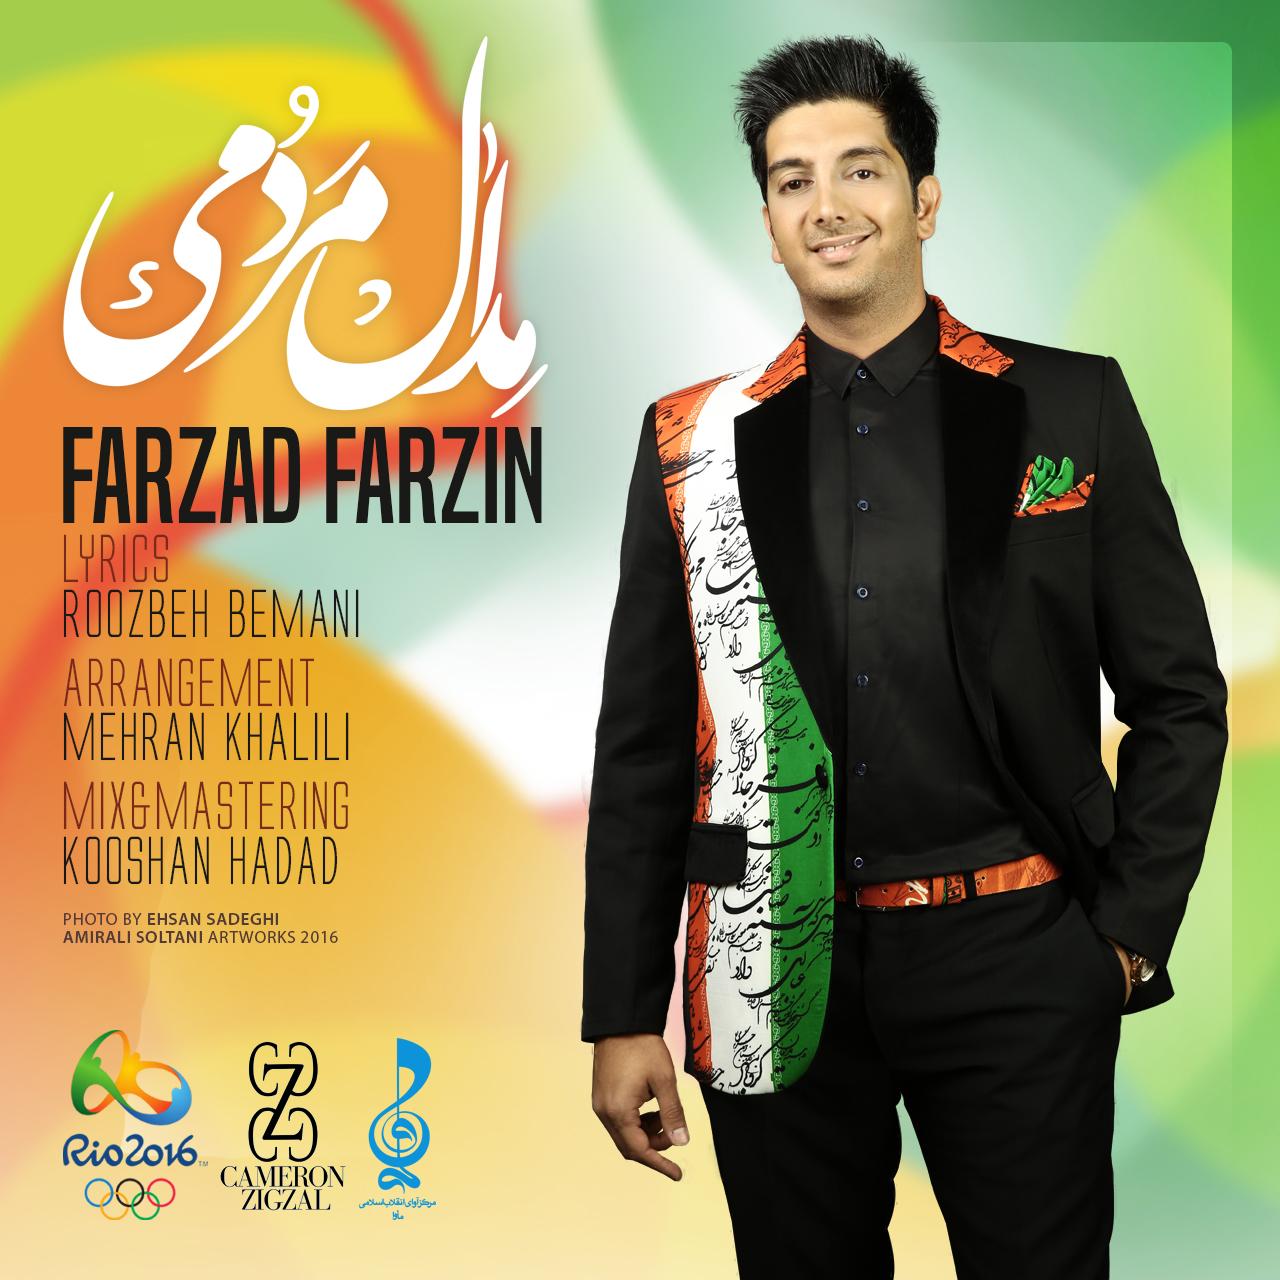 http://s2.picofile.com/file/8263496684/Farzad_Farzin_Medale_Mardomi.jpg